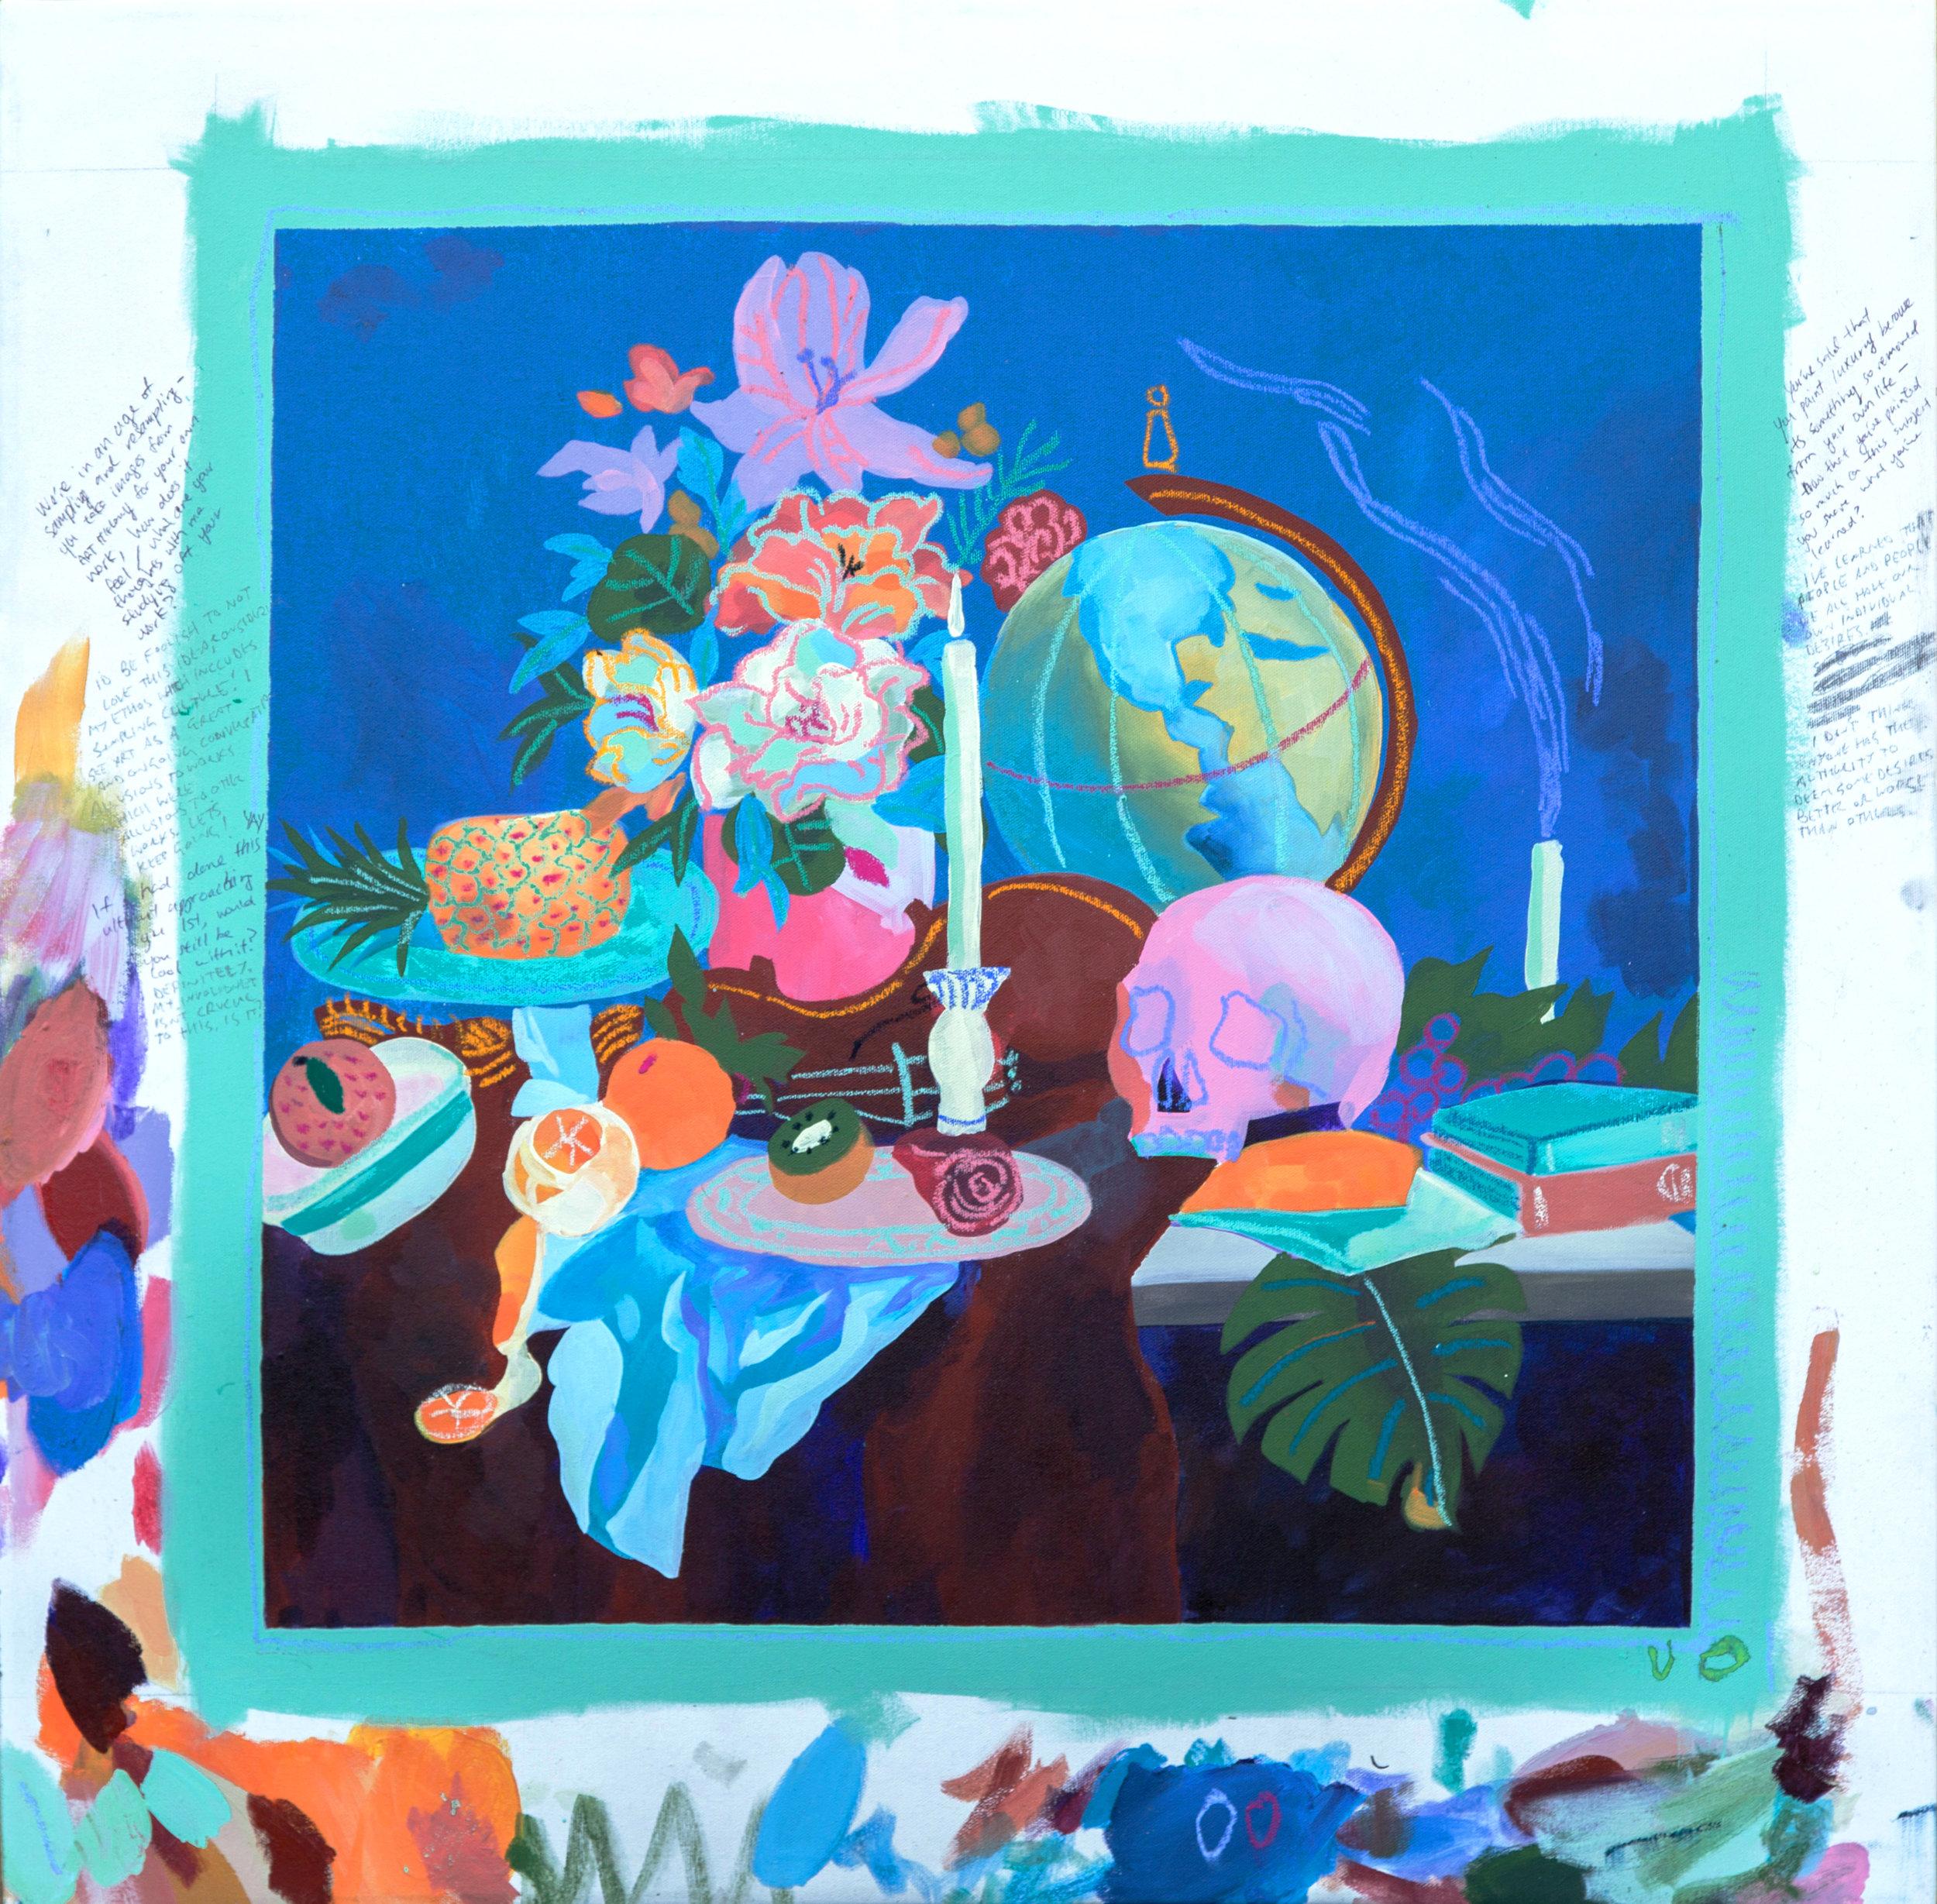 Study of Expensive Painting (Vanitas), 2016